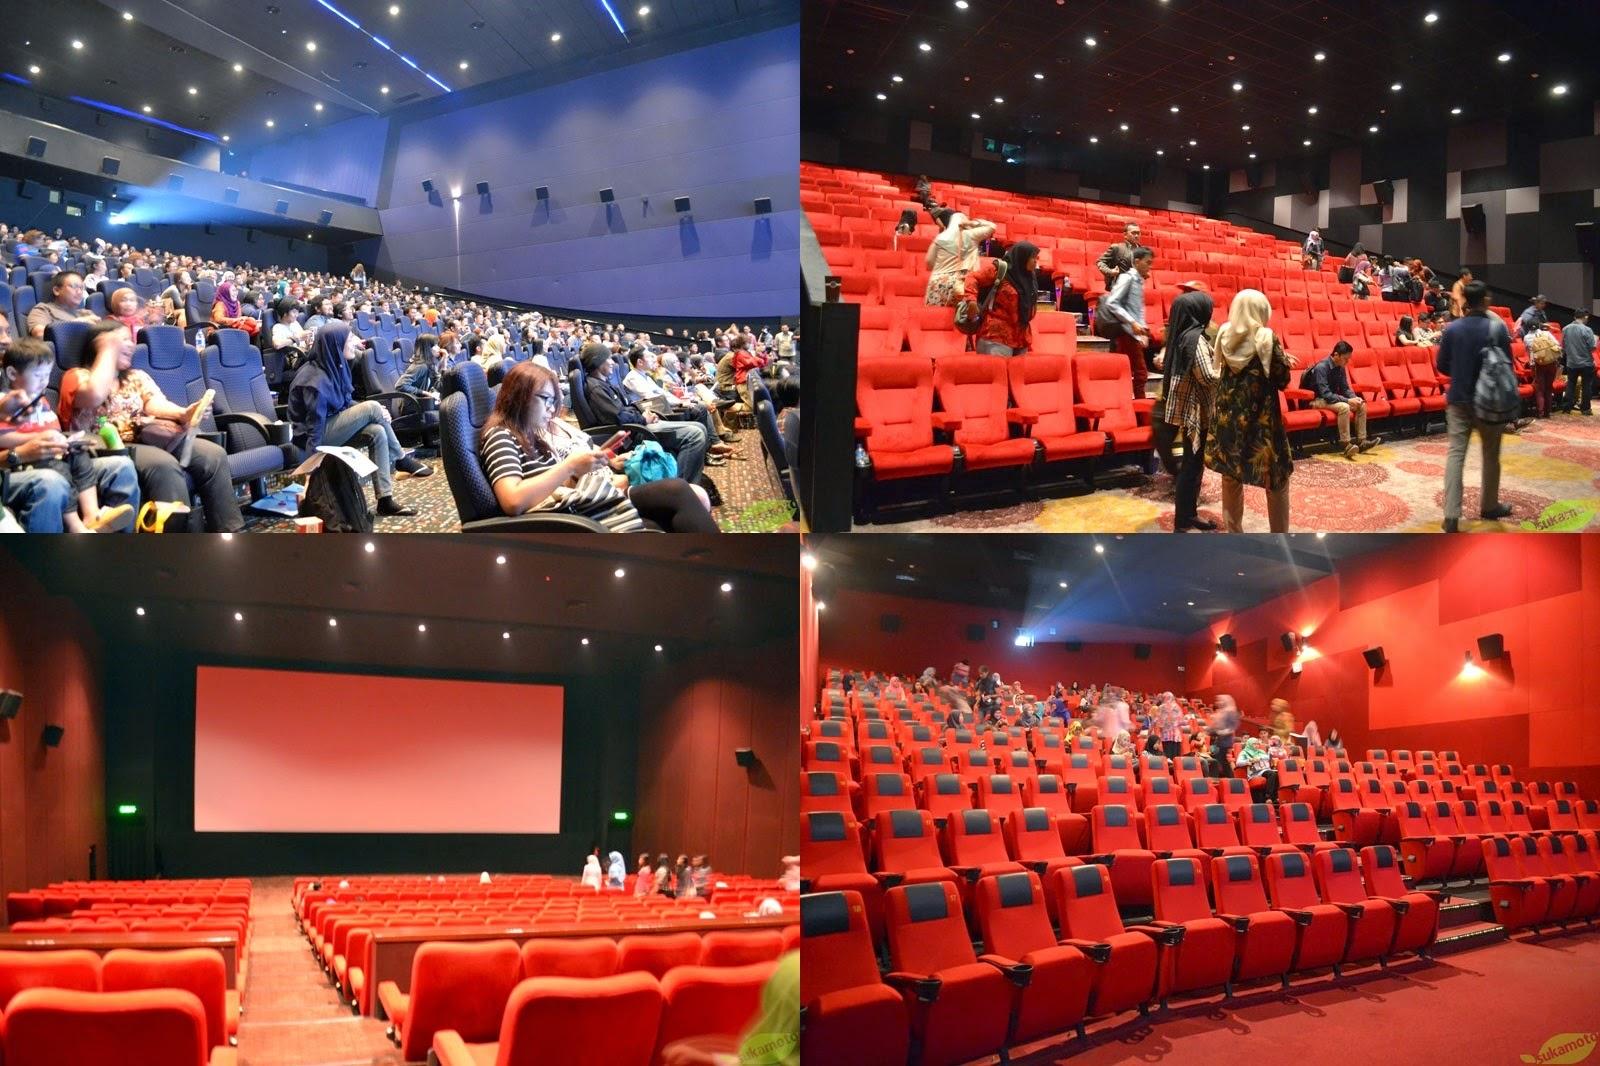 Jadwal Bioskop Xxi Suzuya Marelan Medan   Tonton guardians of the galaxy  vol di cinema medan d90ee2afef